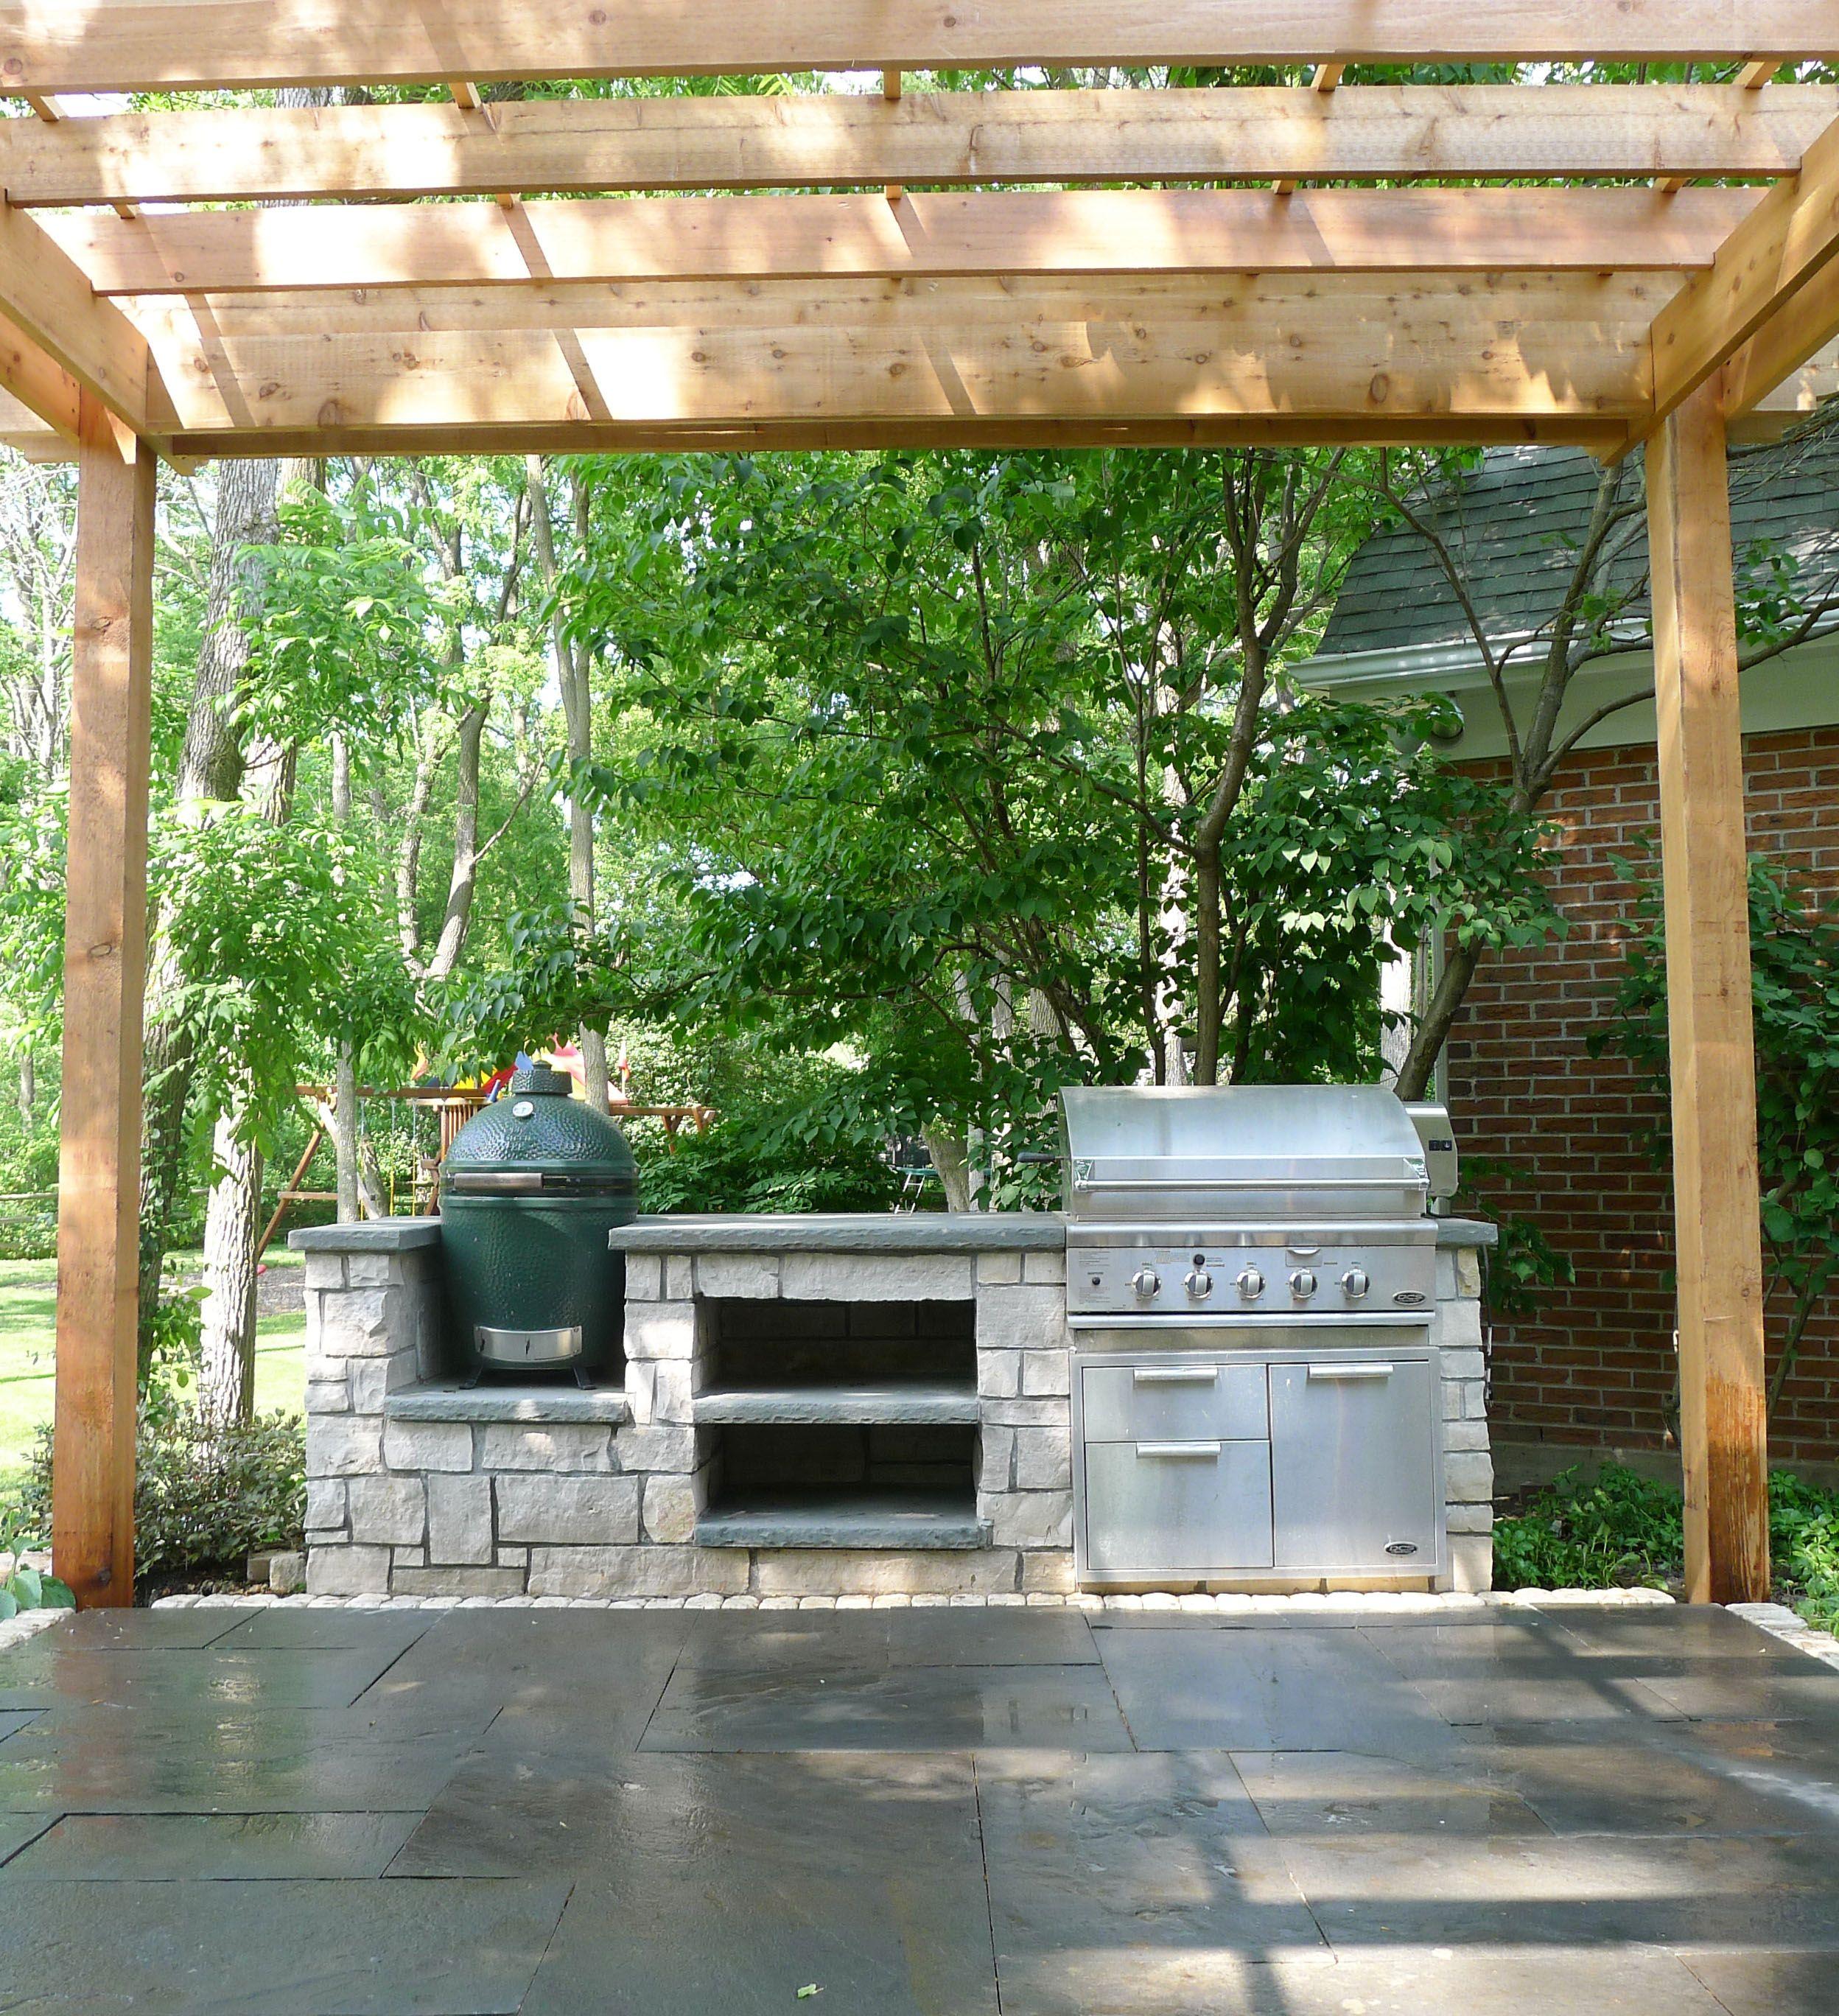 Outdoor Grill Green Egg Outdoor Kitchen Pergola Shade Structure Bluestone Patio Outdoor Kitchen Patio Pergola Backyard Patio